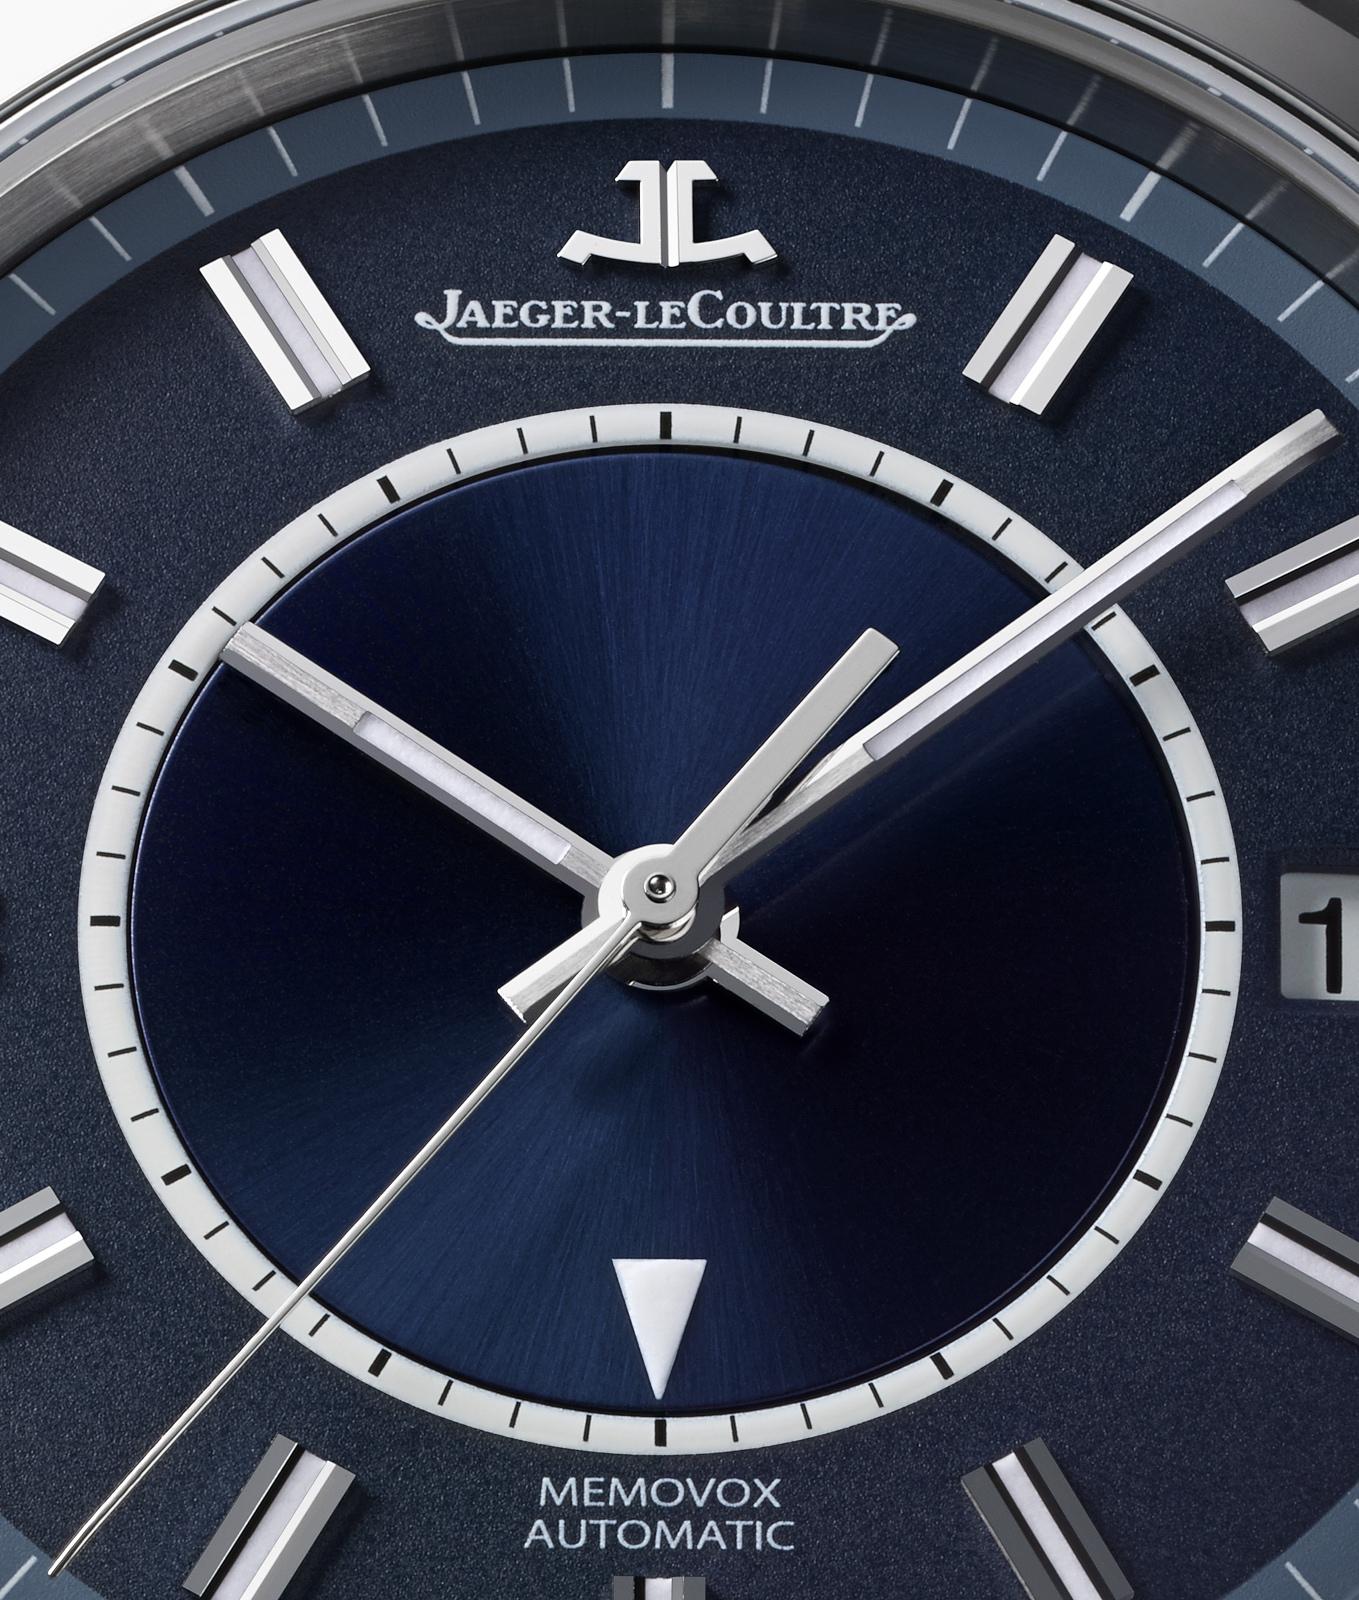 Jaeger-LeCoultre Master Memovox Boutique Edition - dial